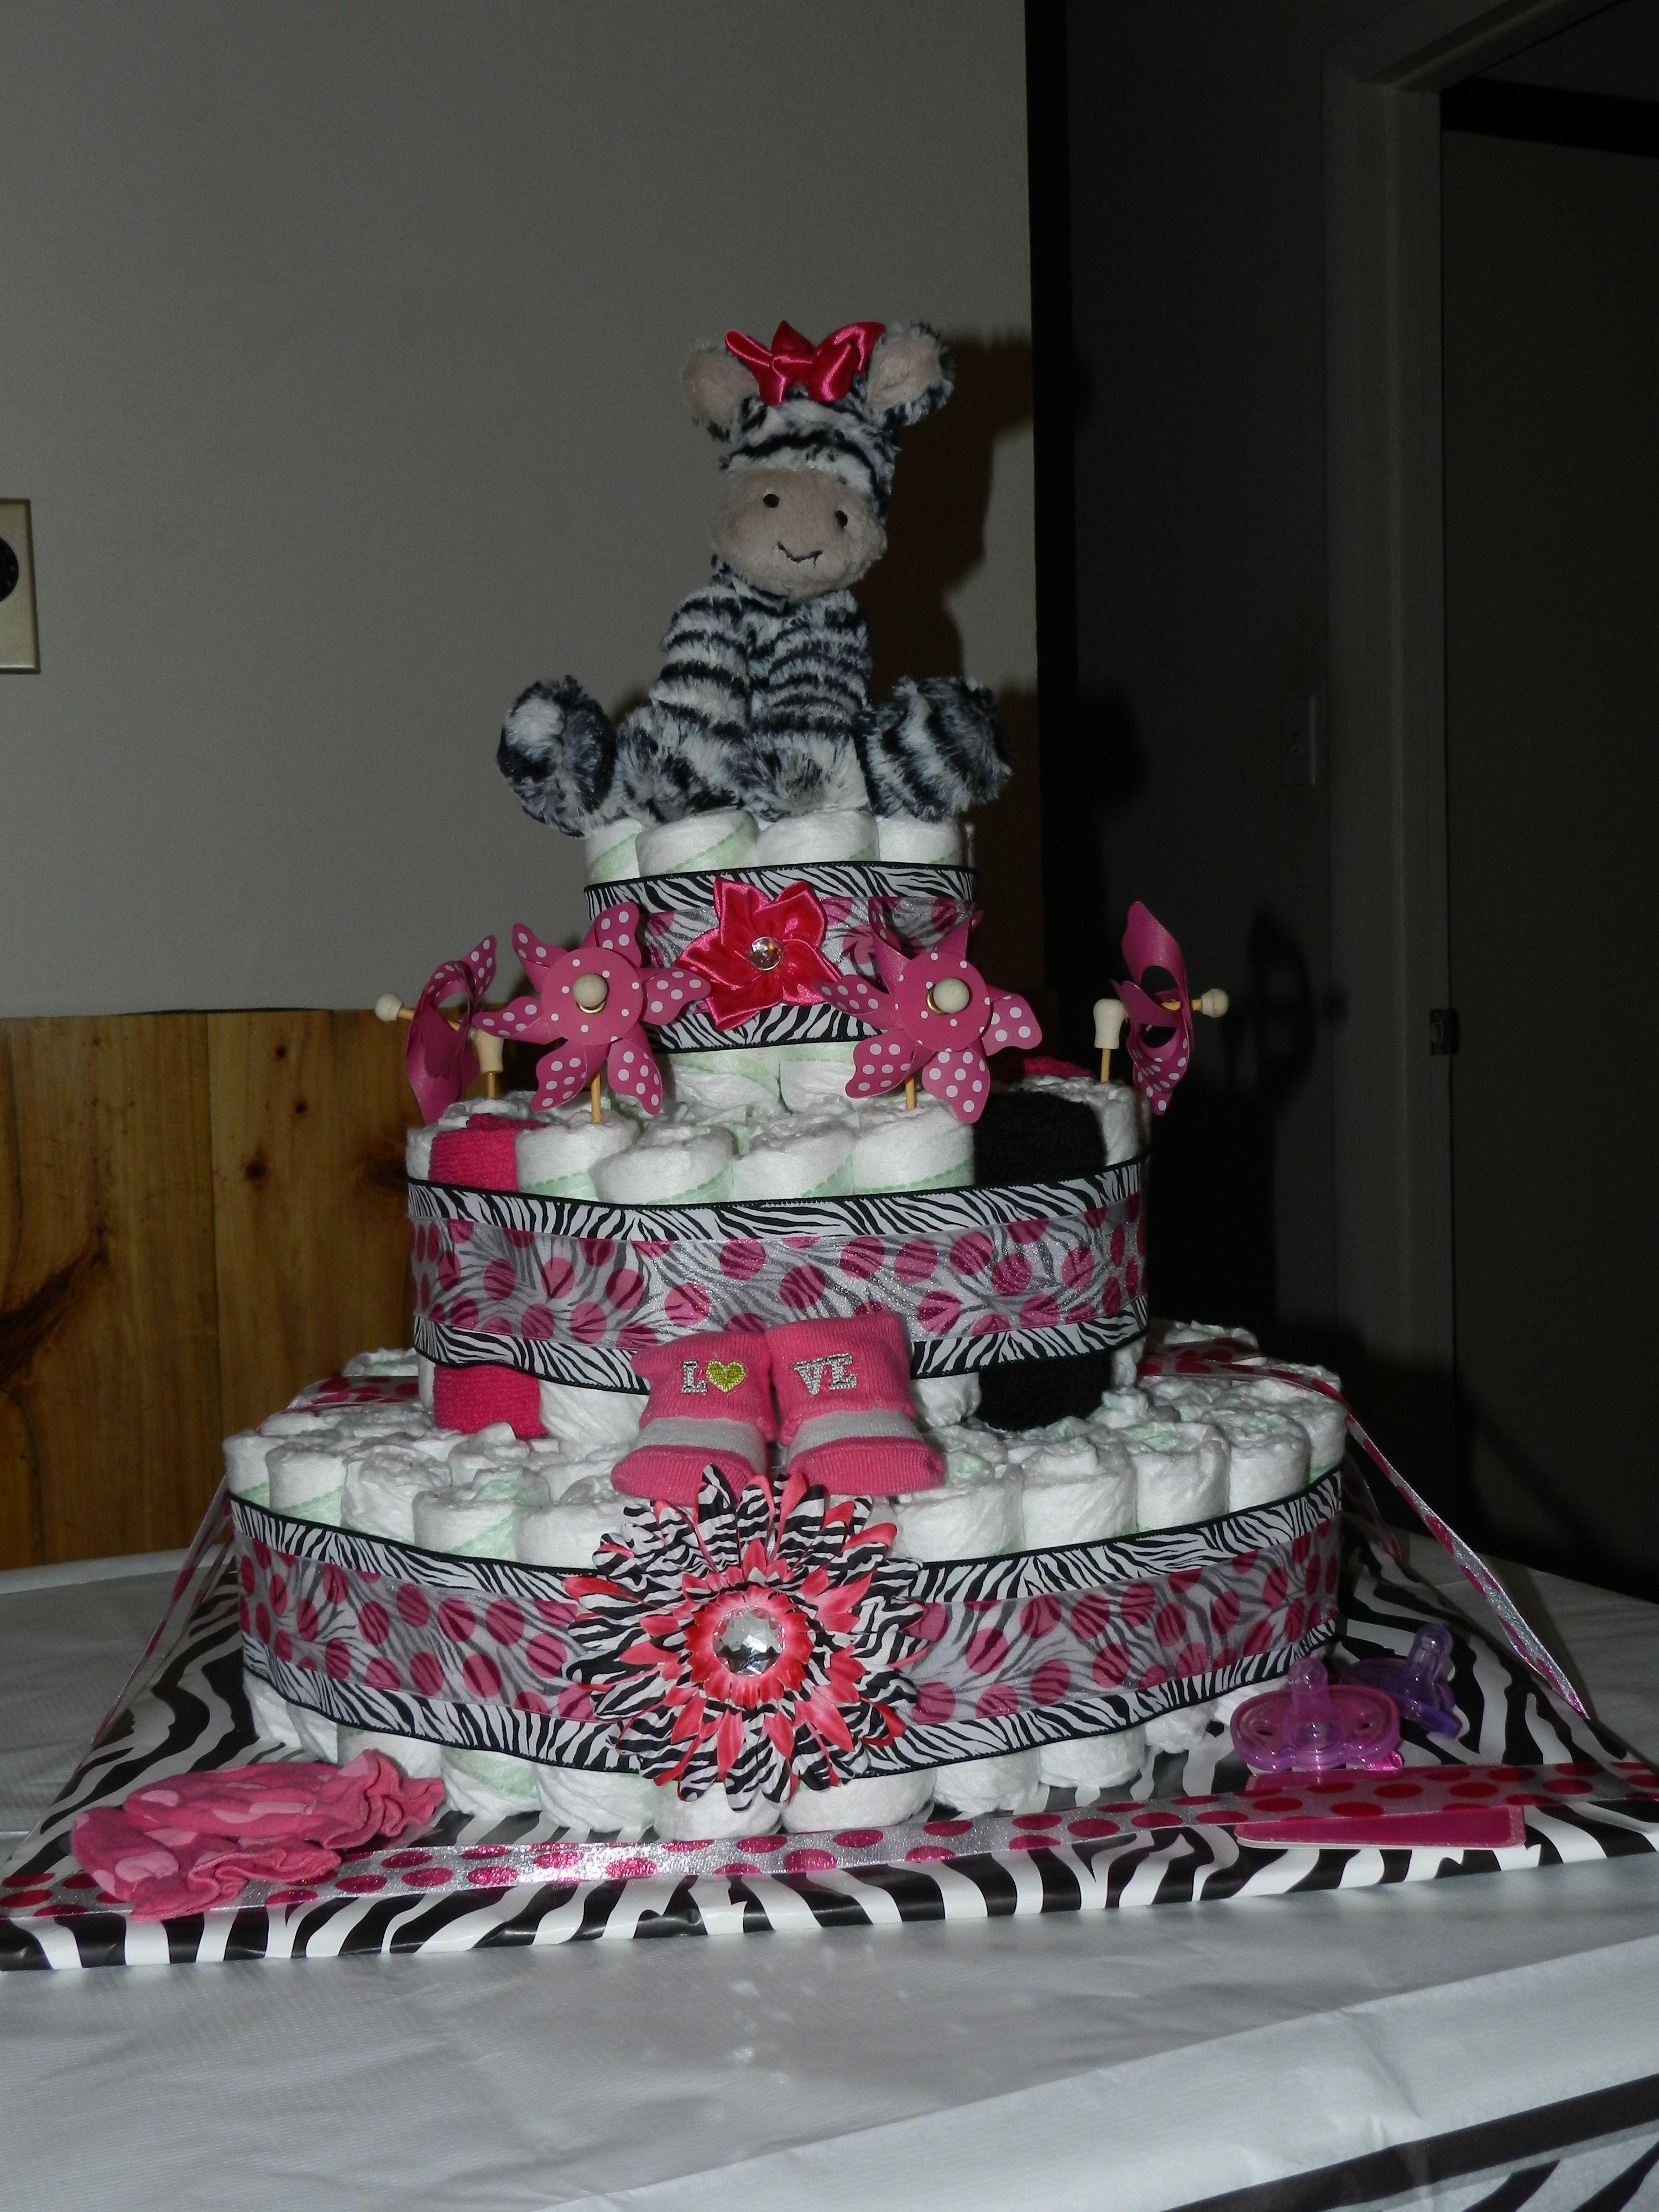 Zebra Diaper Cake I Made For A Friend S Baby Shower Baby Shower